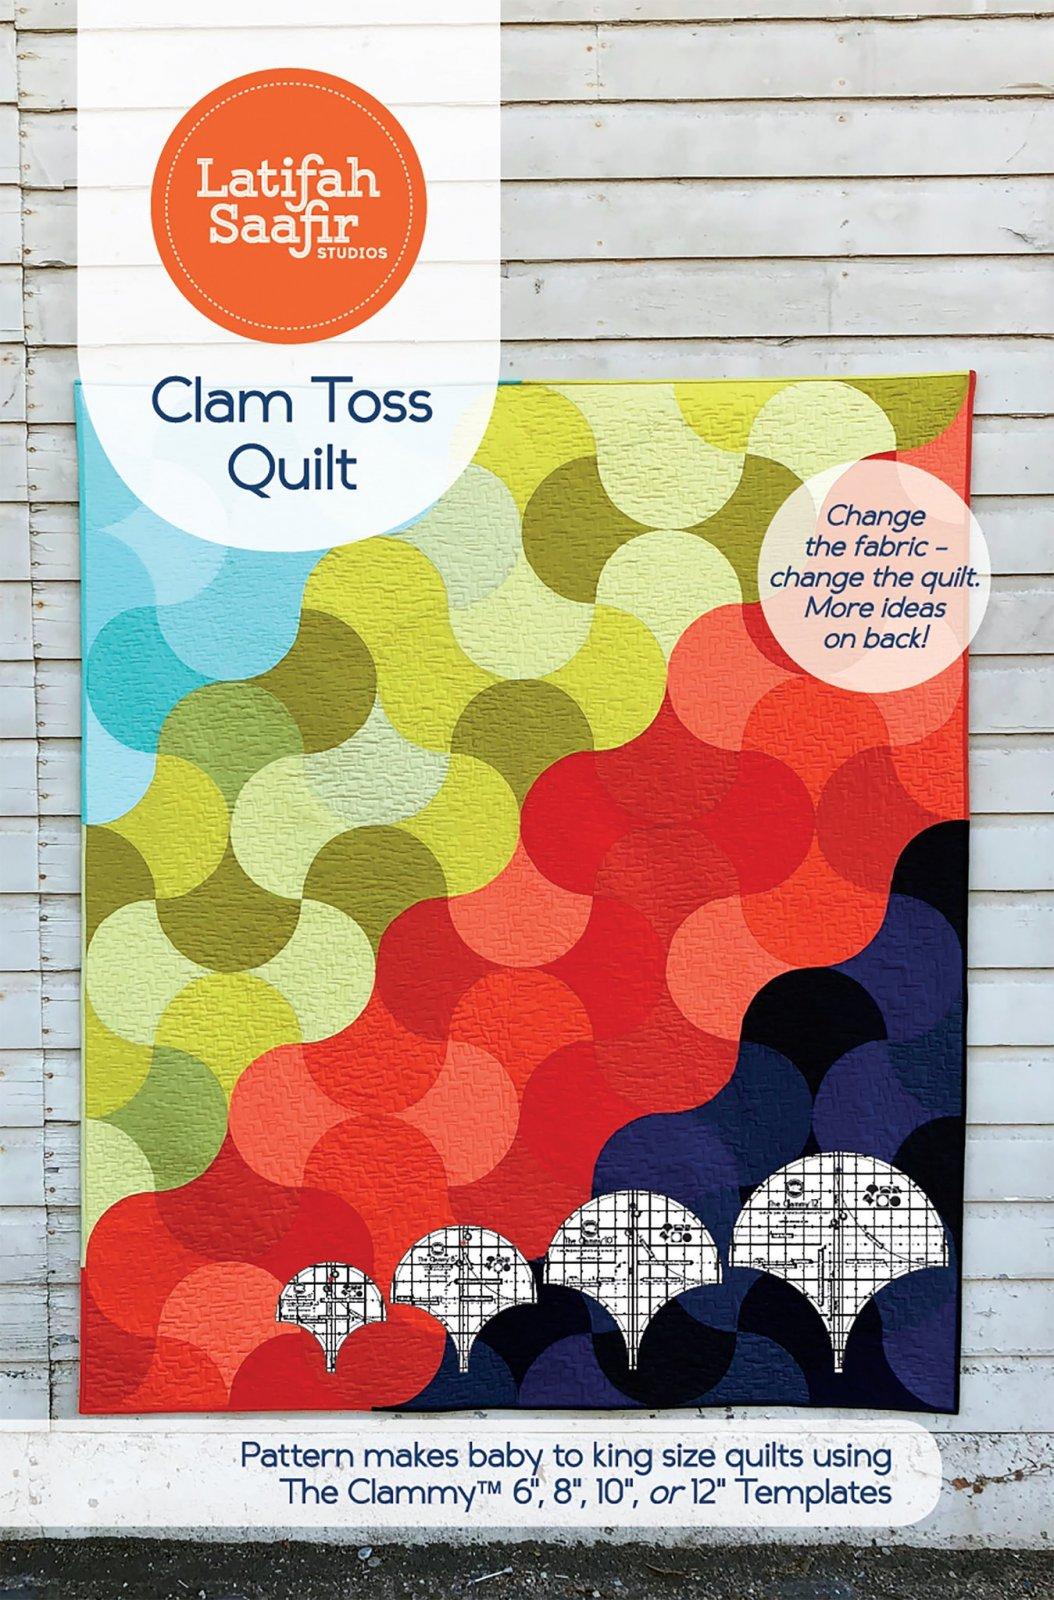 Clam Toss Quilt Pattern